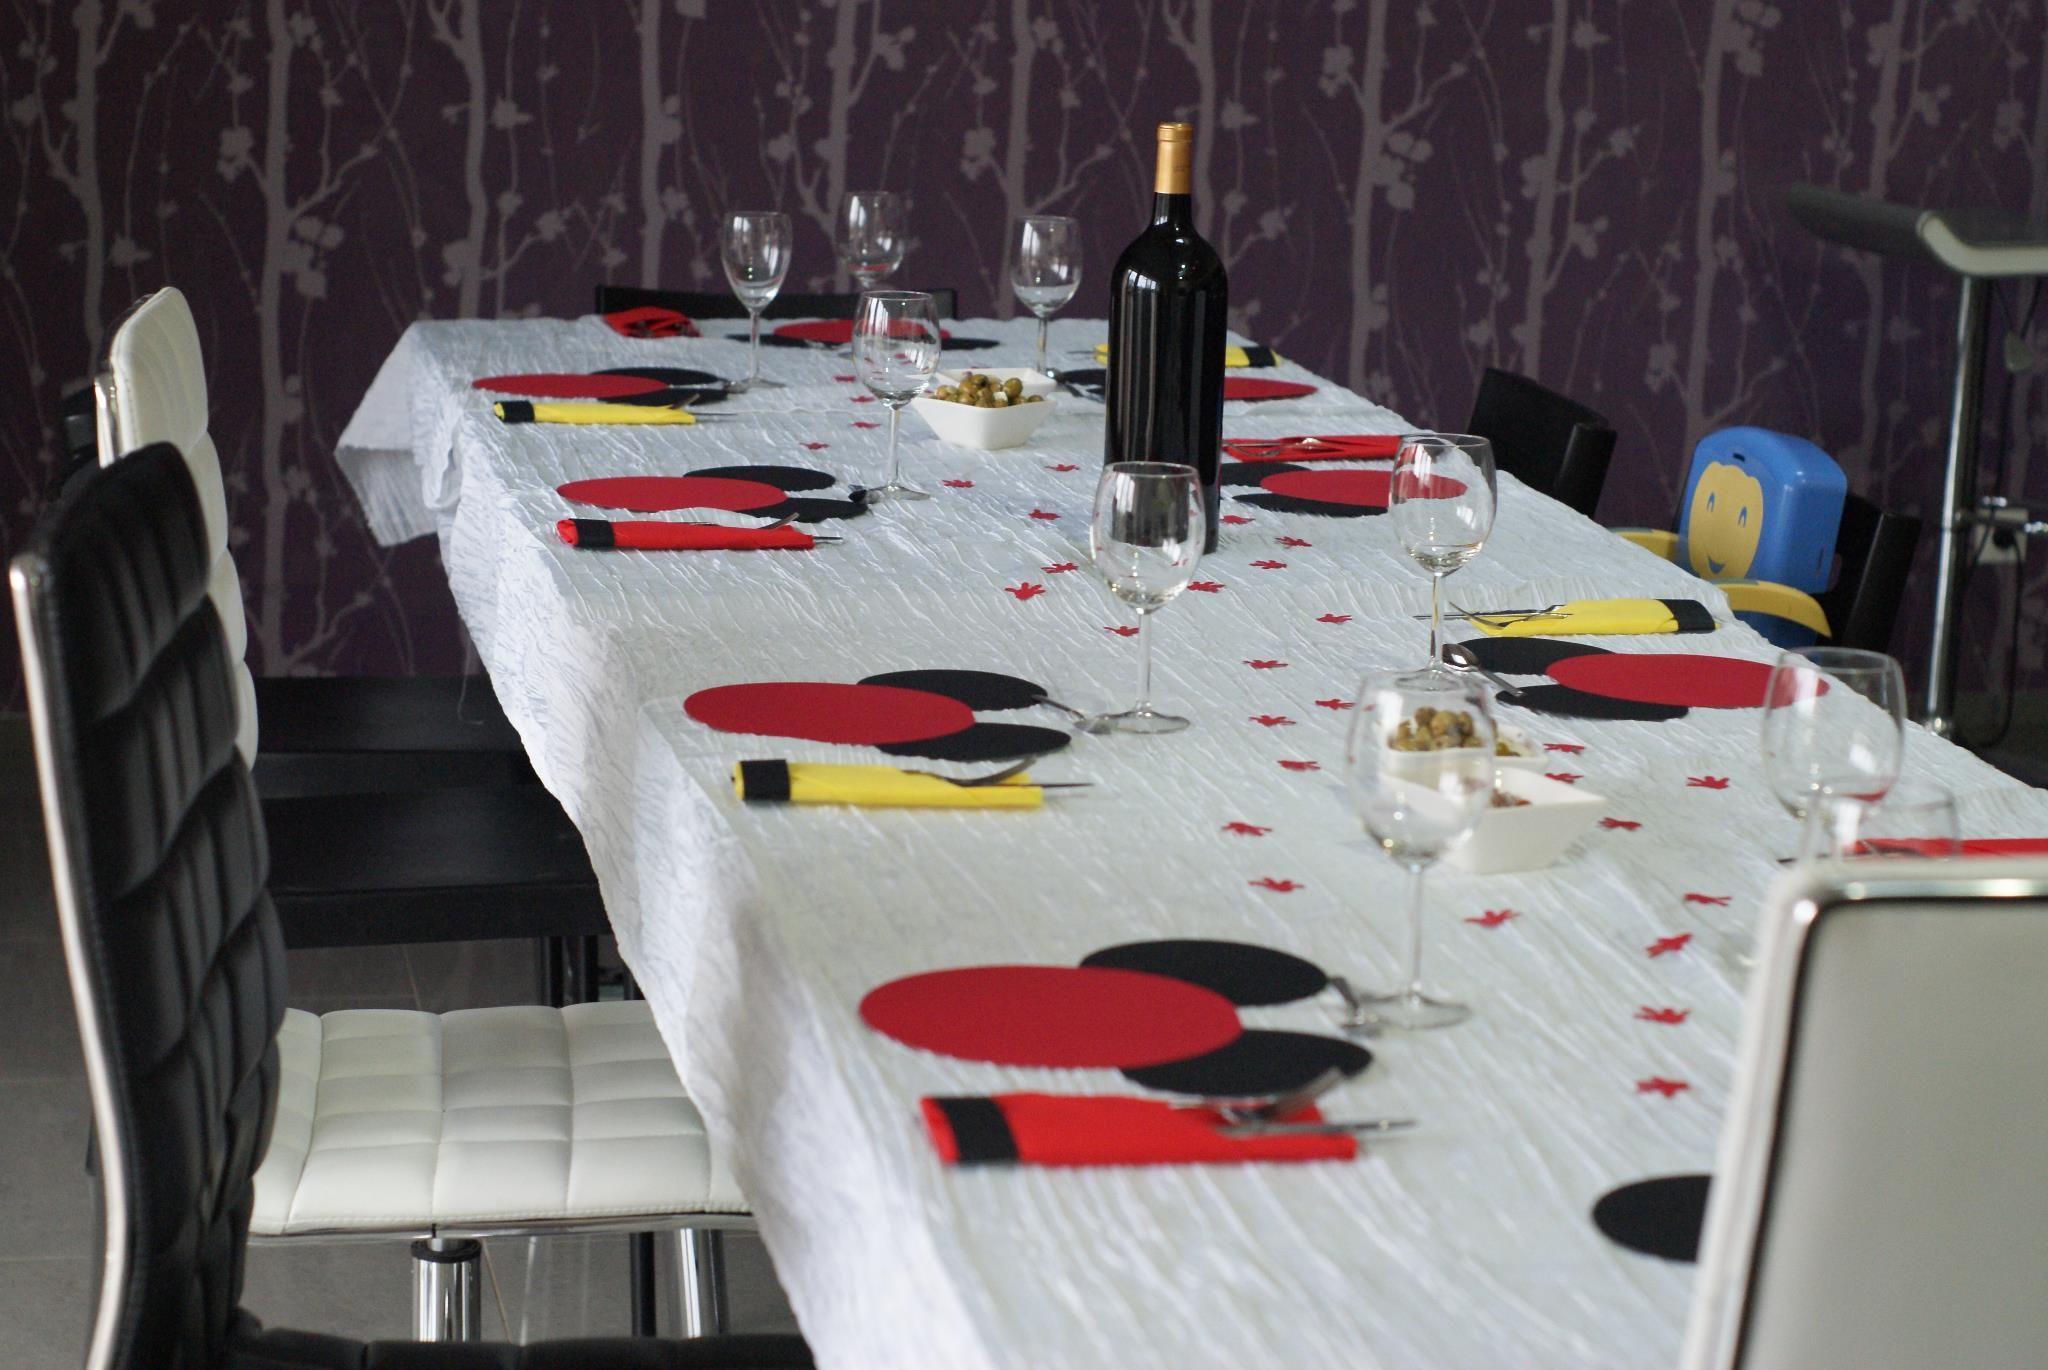 3 ans louis mickey mes r alisations 2013 pinterest anniversaire mickey anniversaires et. Black Bedroom Furniture Sets. Home Design Ideas